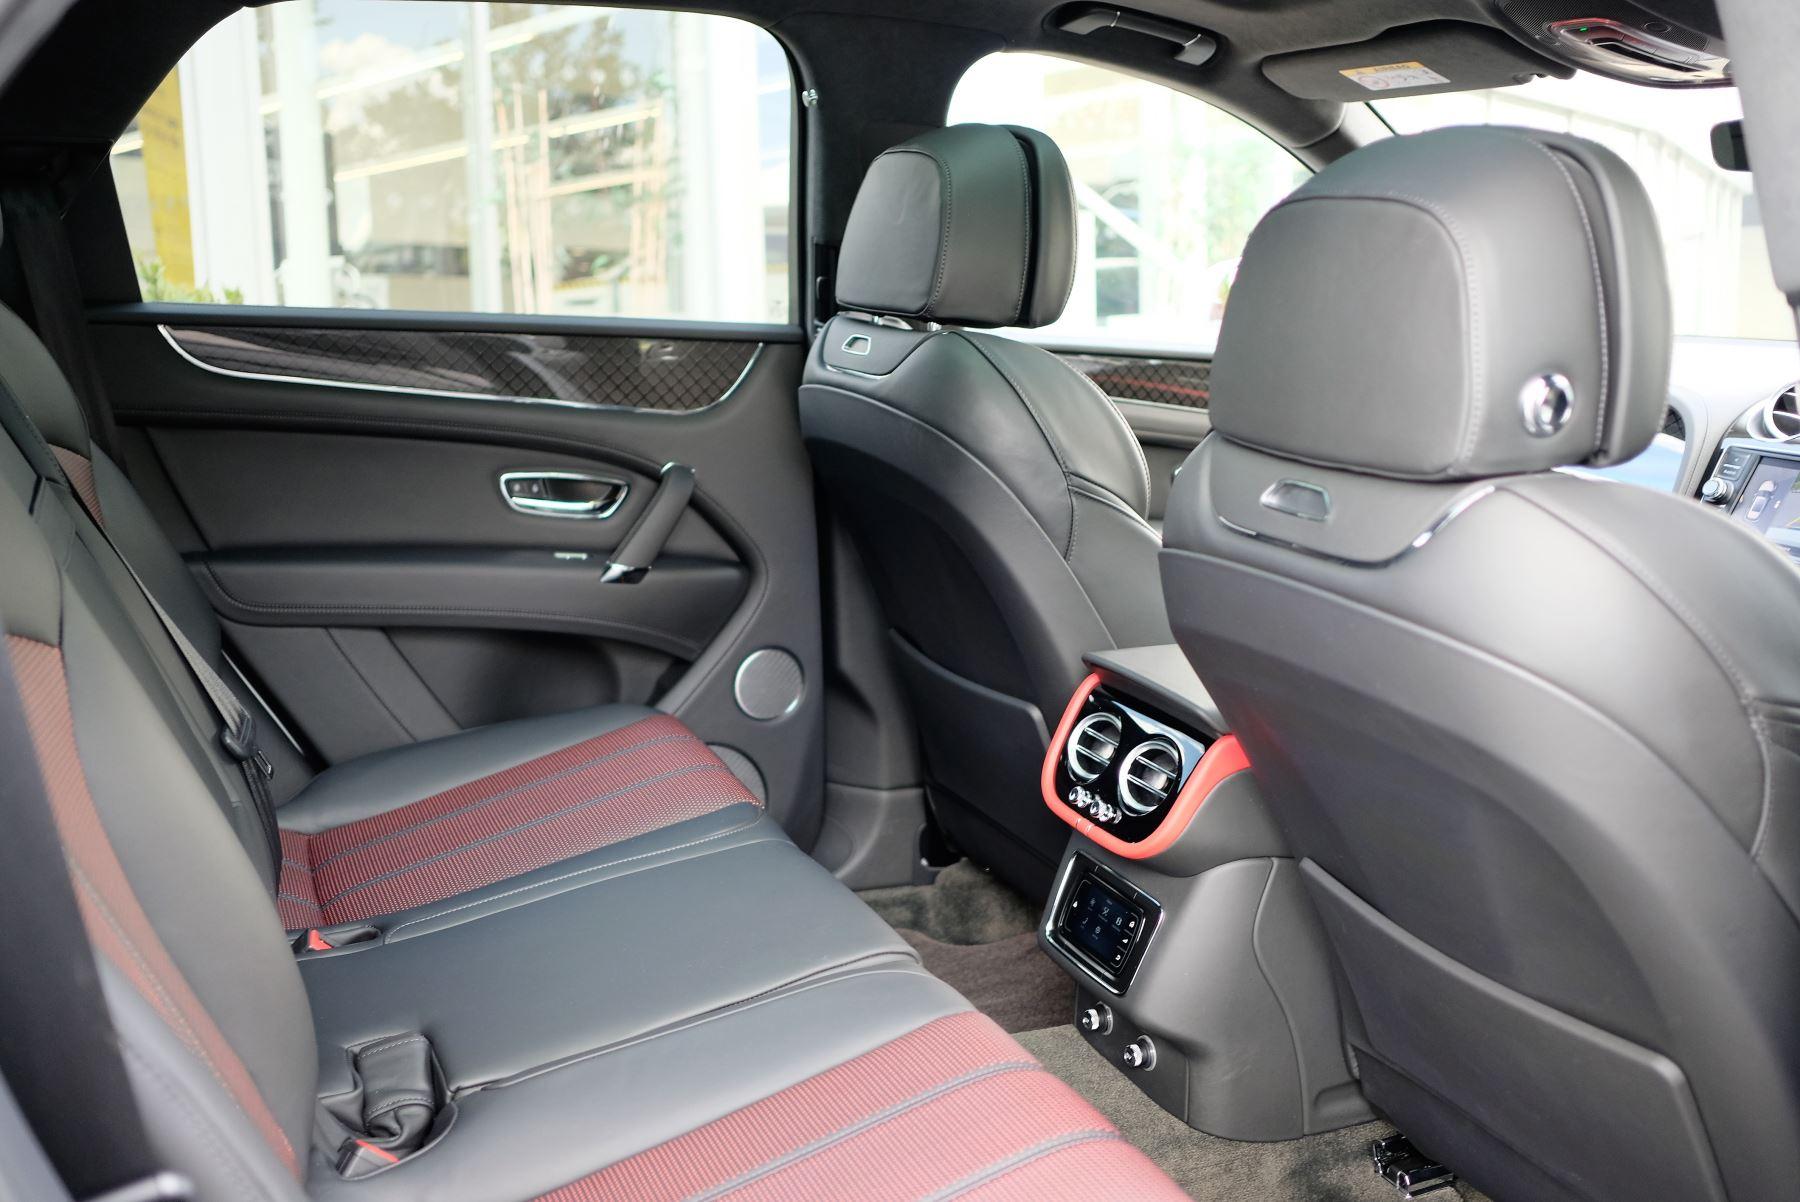 Bentley Bentayga V8 4.0 Design Series 5dr image 26